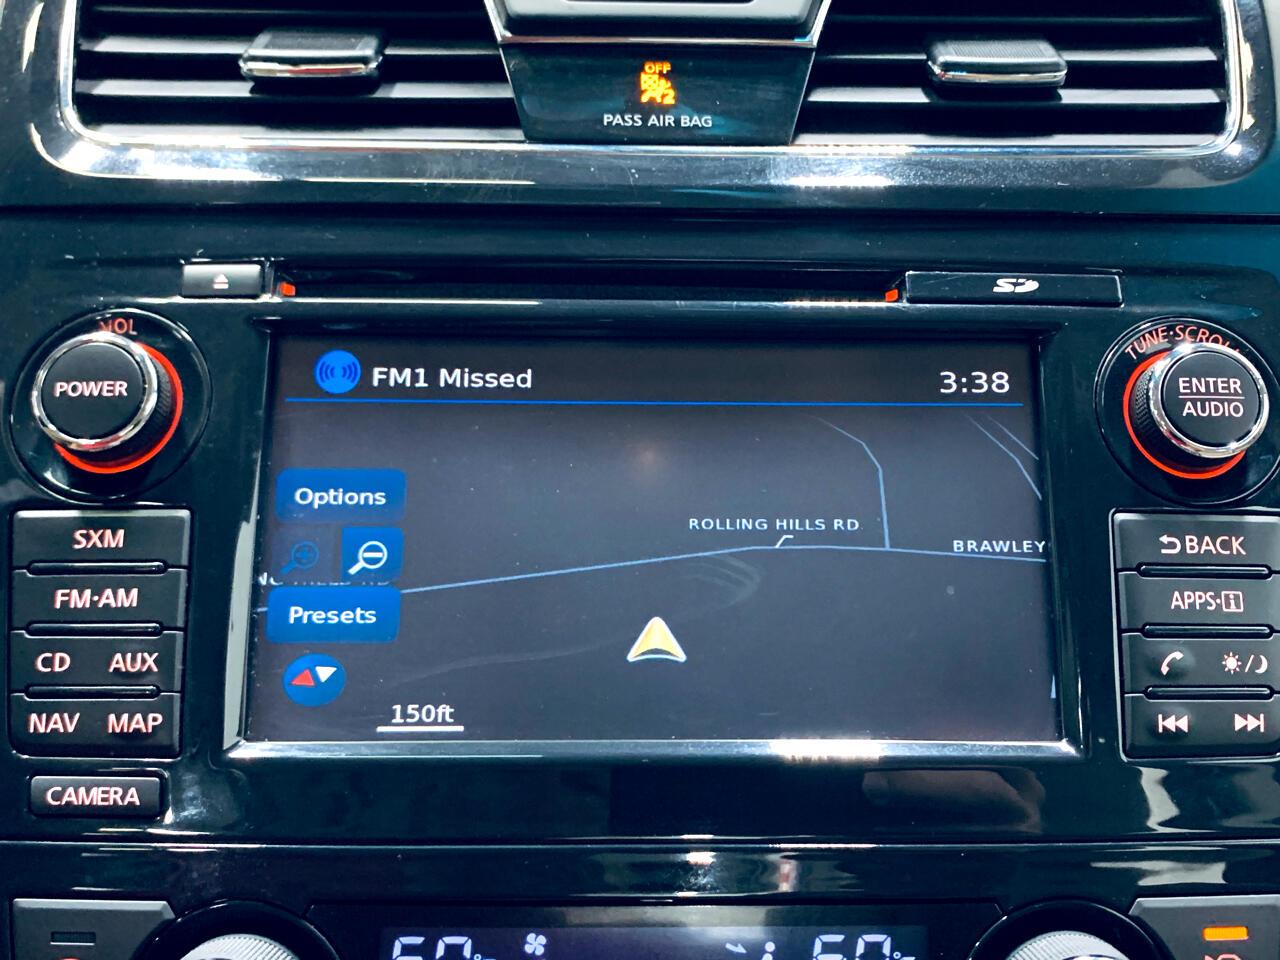 2015 Nissan Altima 4dr Sdn I4 2.5 SL